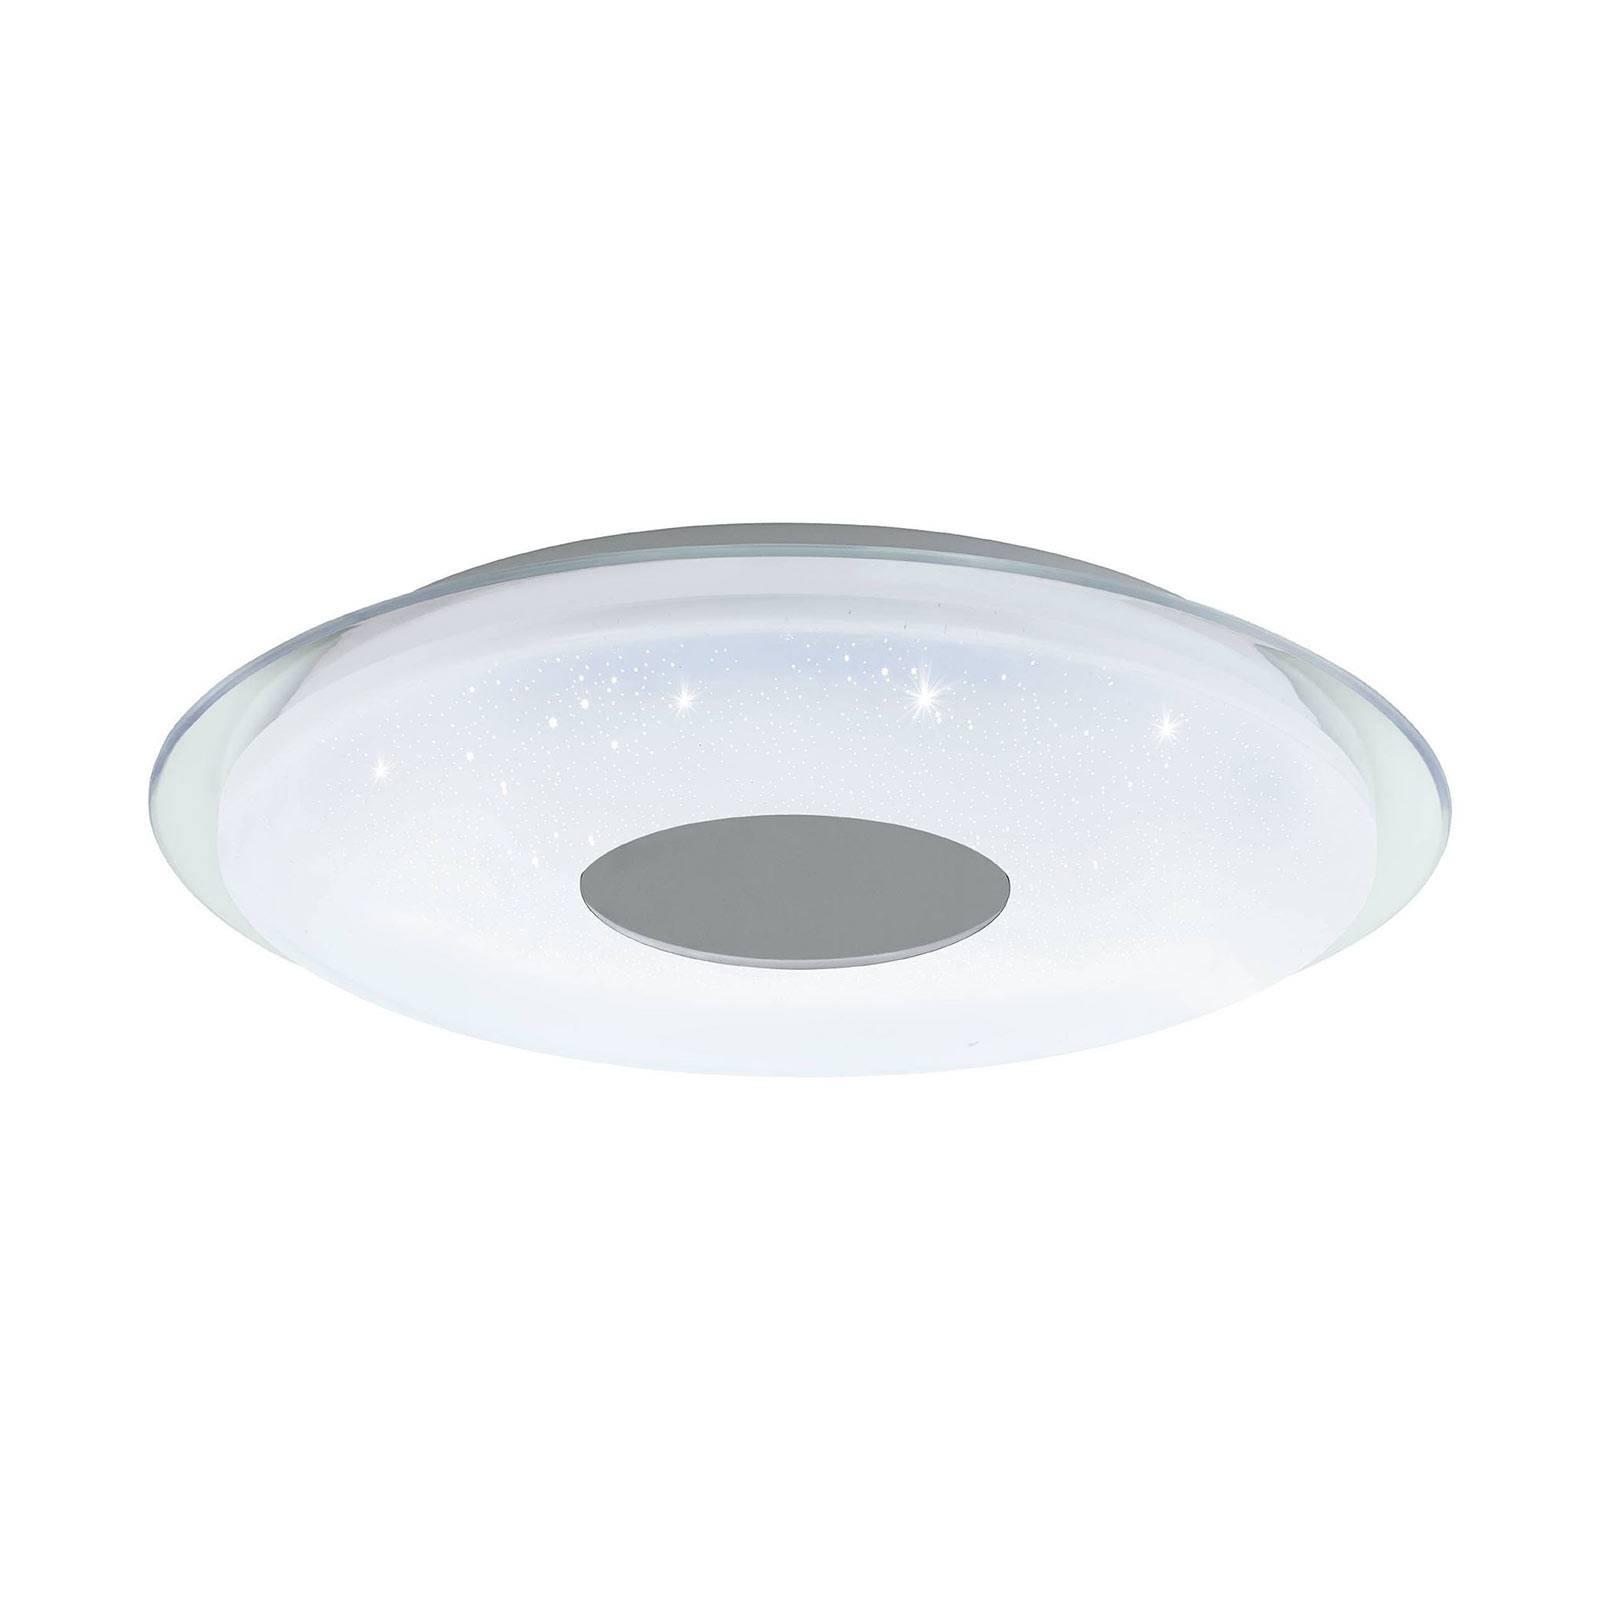 EGLO connect Lanciano-C LED-Deckenleuchte Ø 56cm